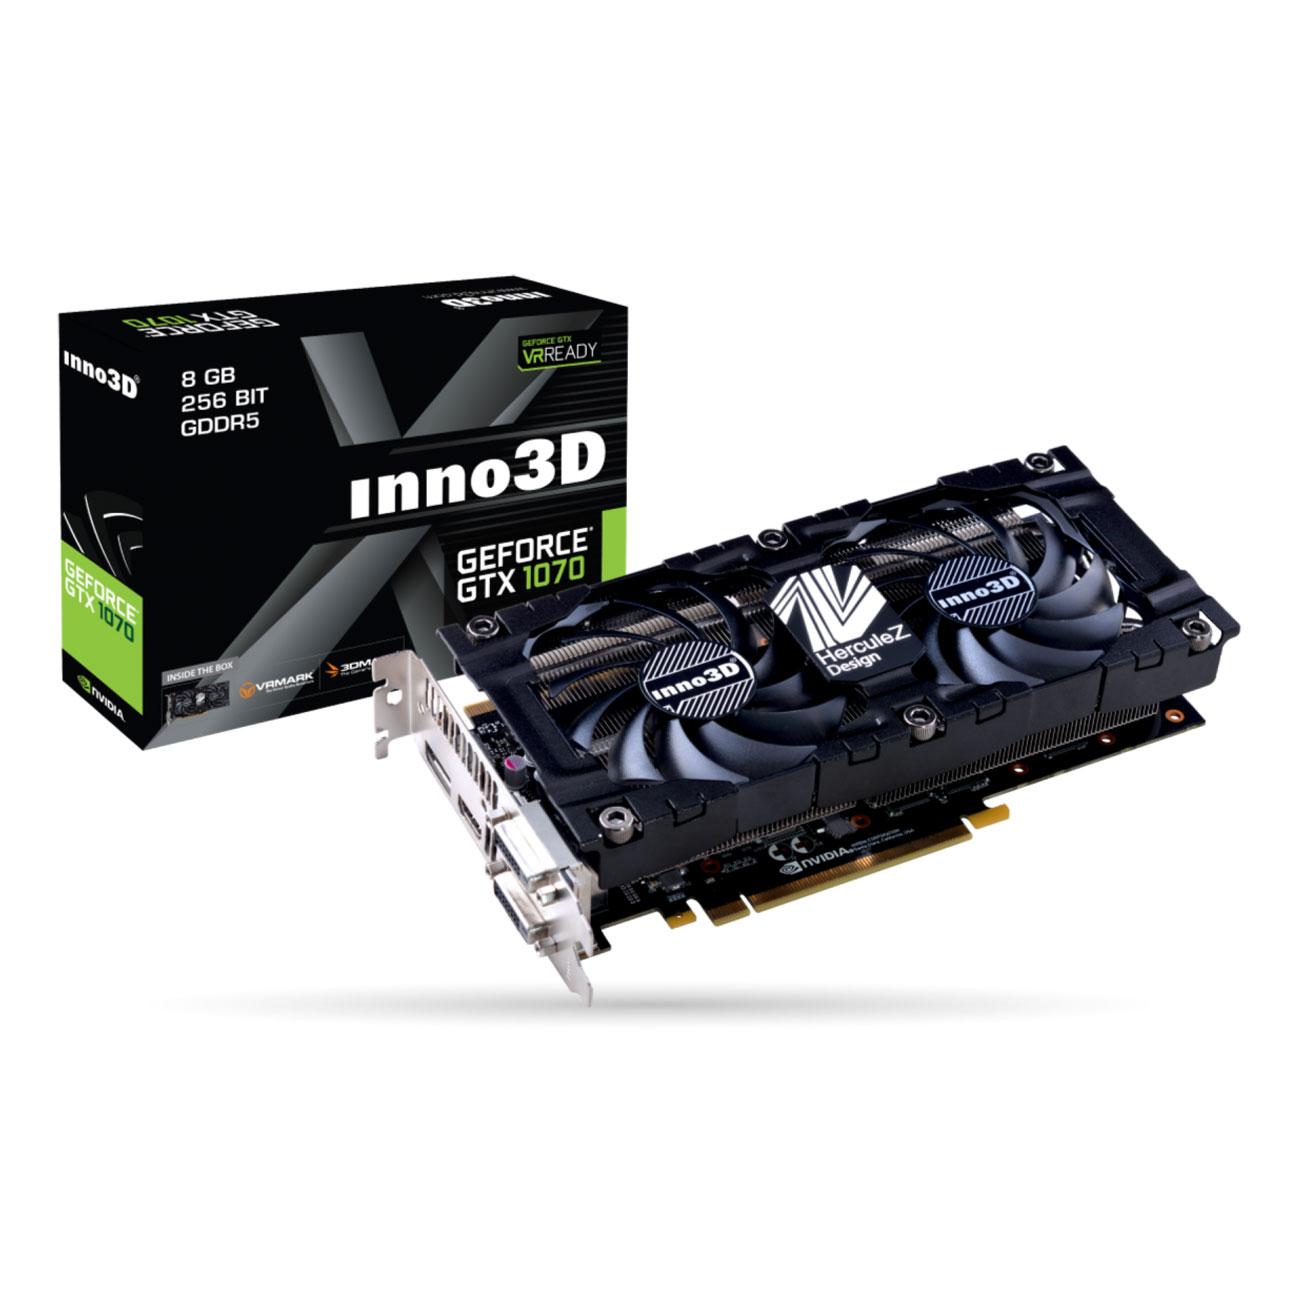 Carte graphique Inno3D GeForce GTX 1070 Twin X2 V3 - 8 Go DDR5 à